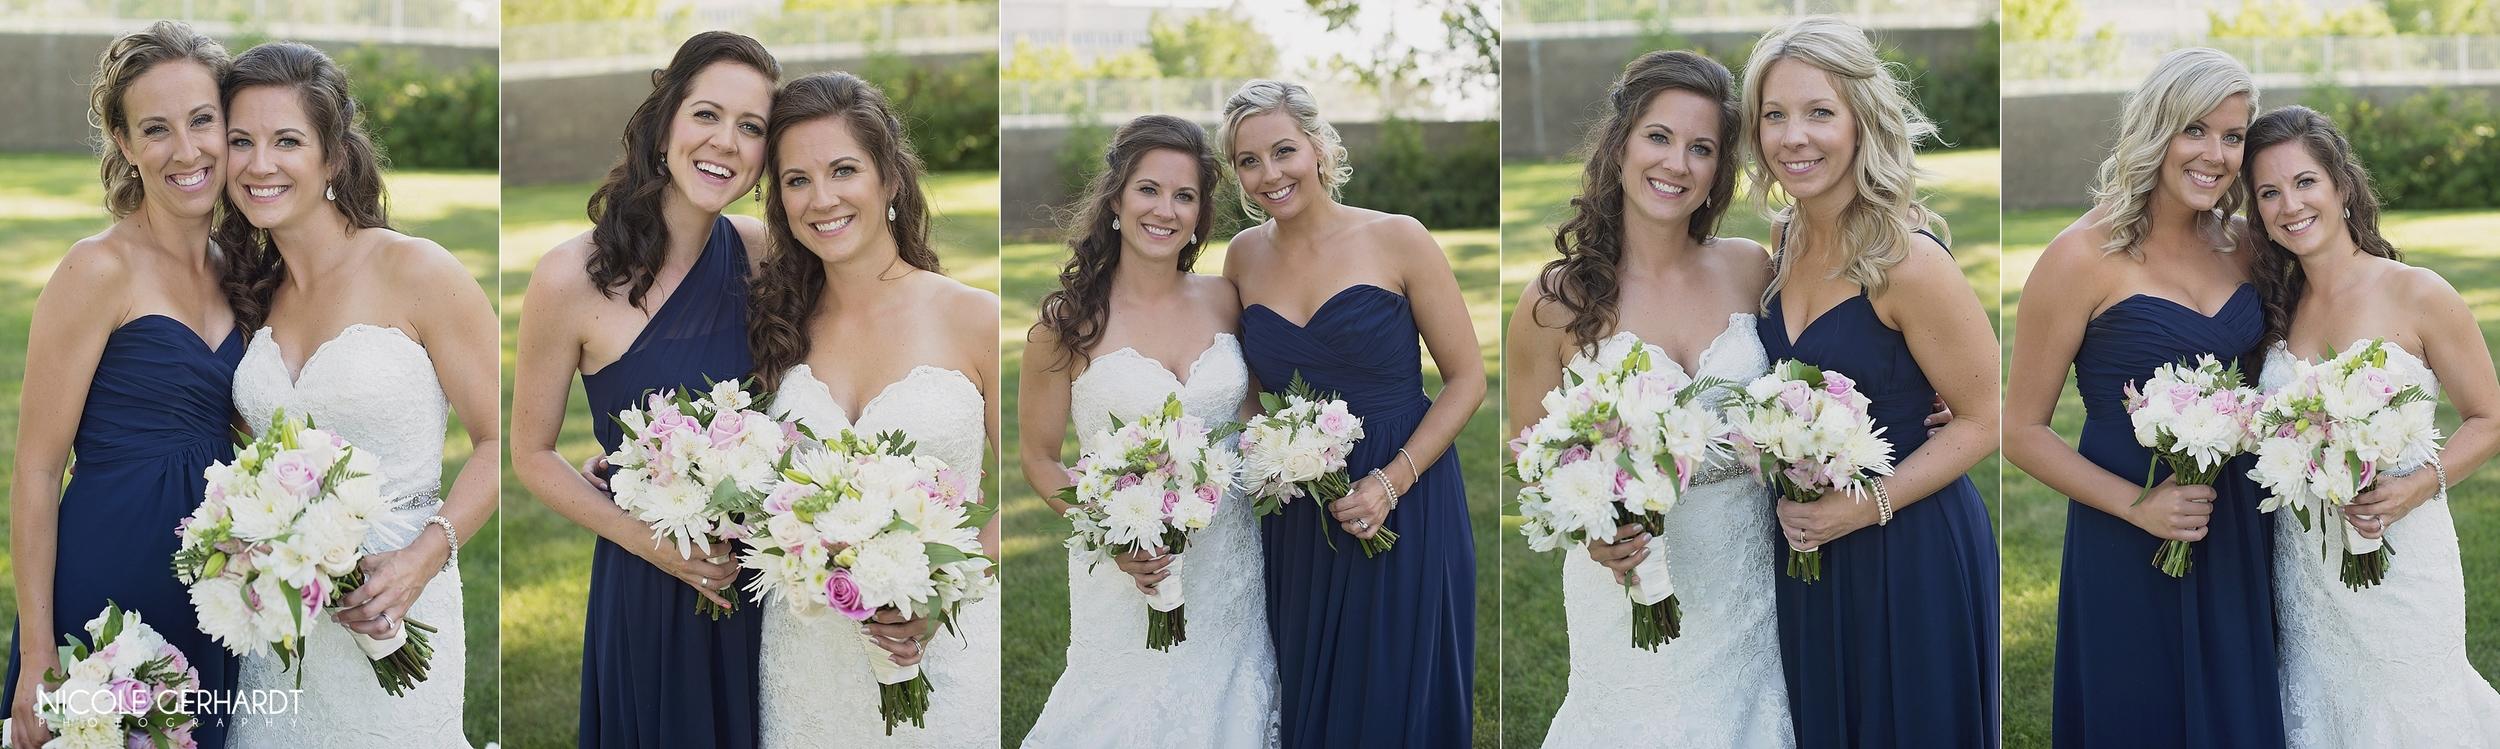 regina_wedding _ photographer20.jpg